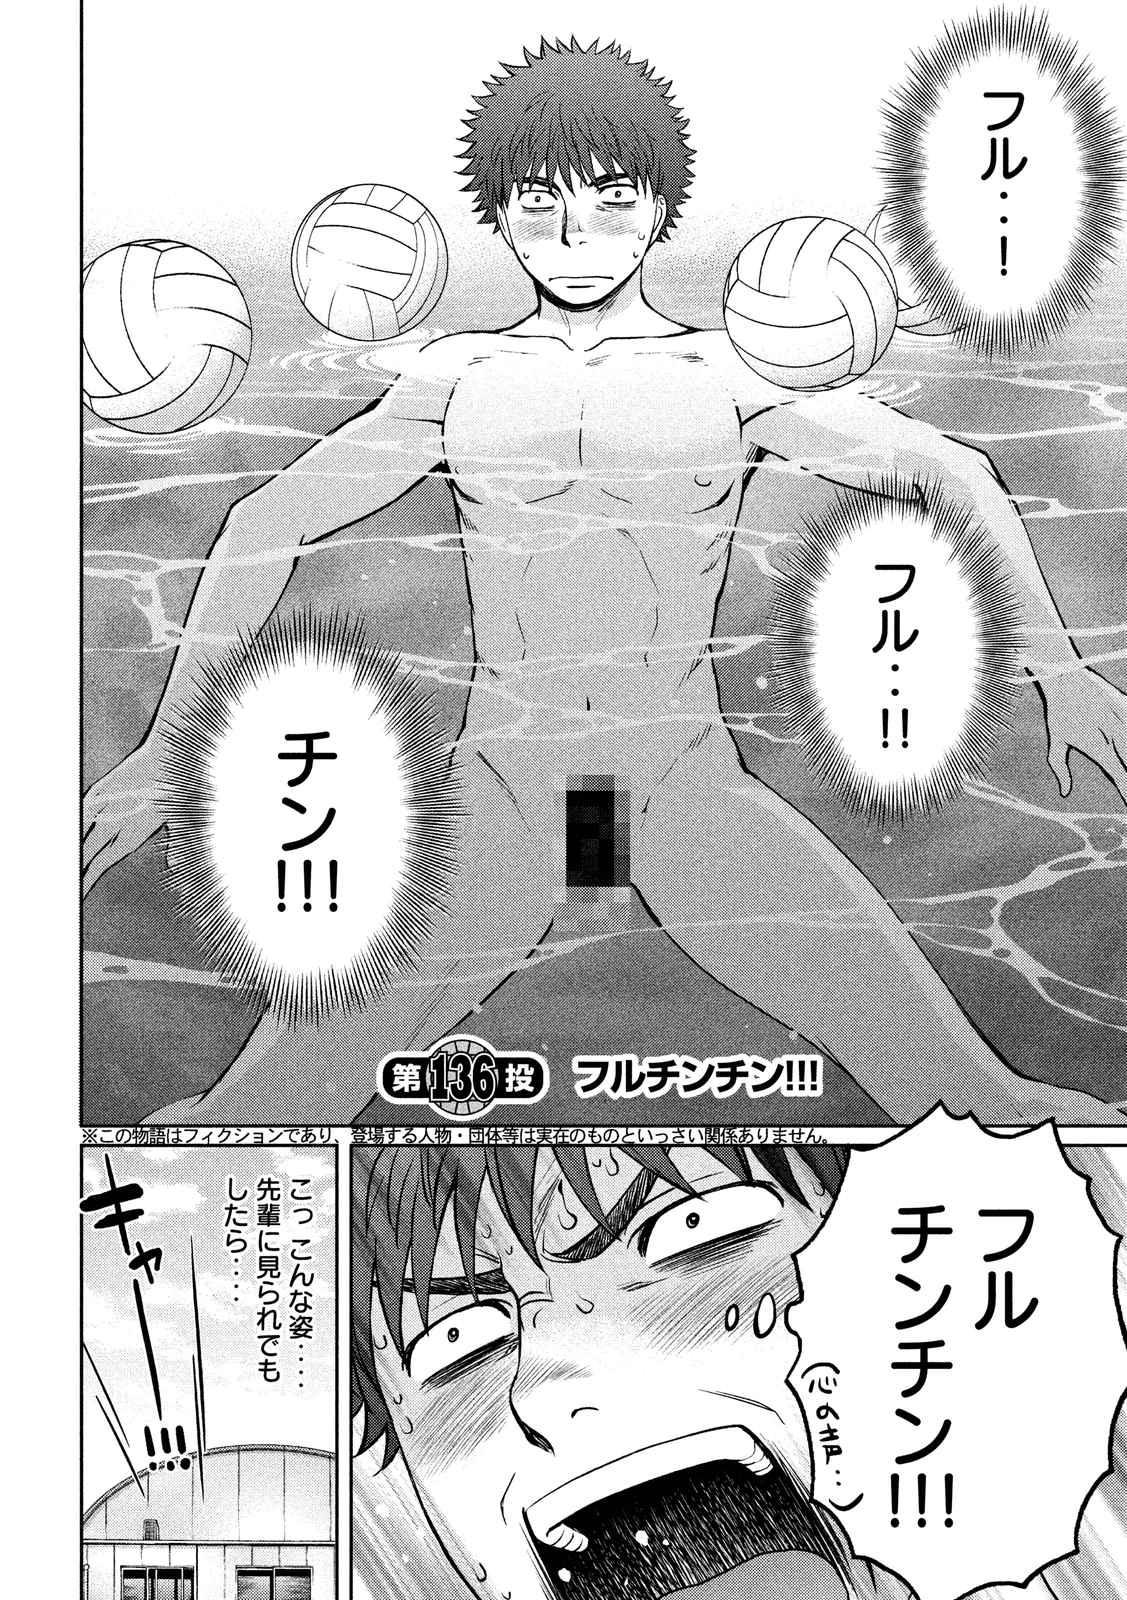 Hantsu x Trash - Chapter 136 - Page 2